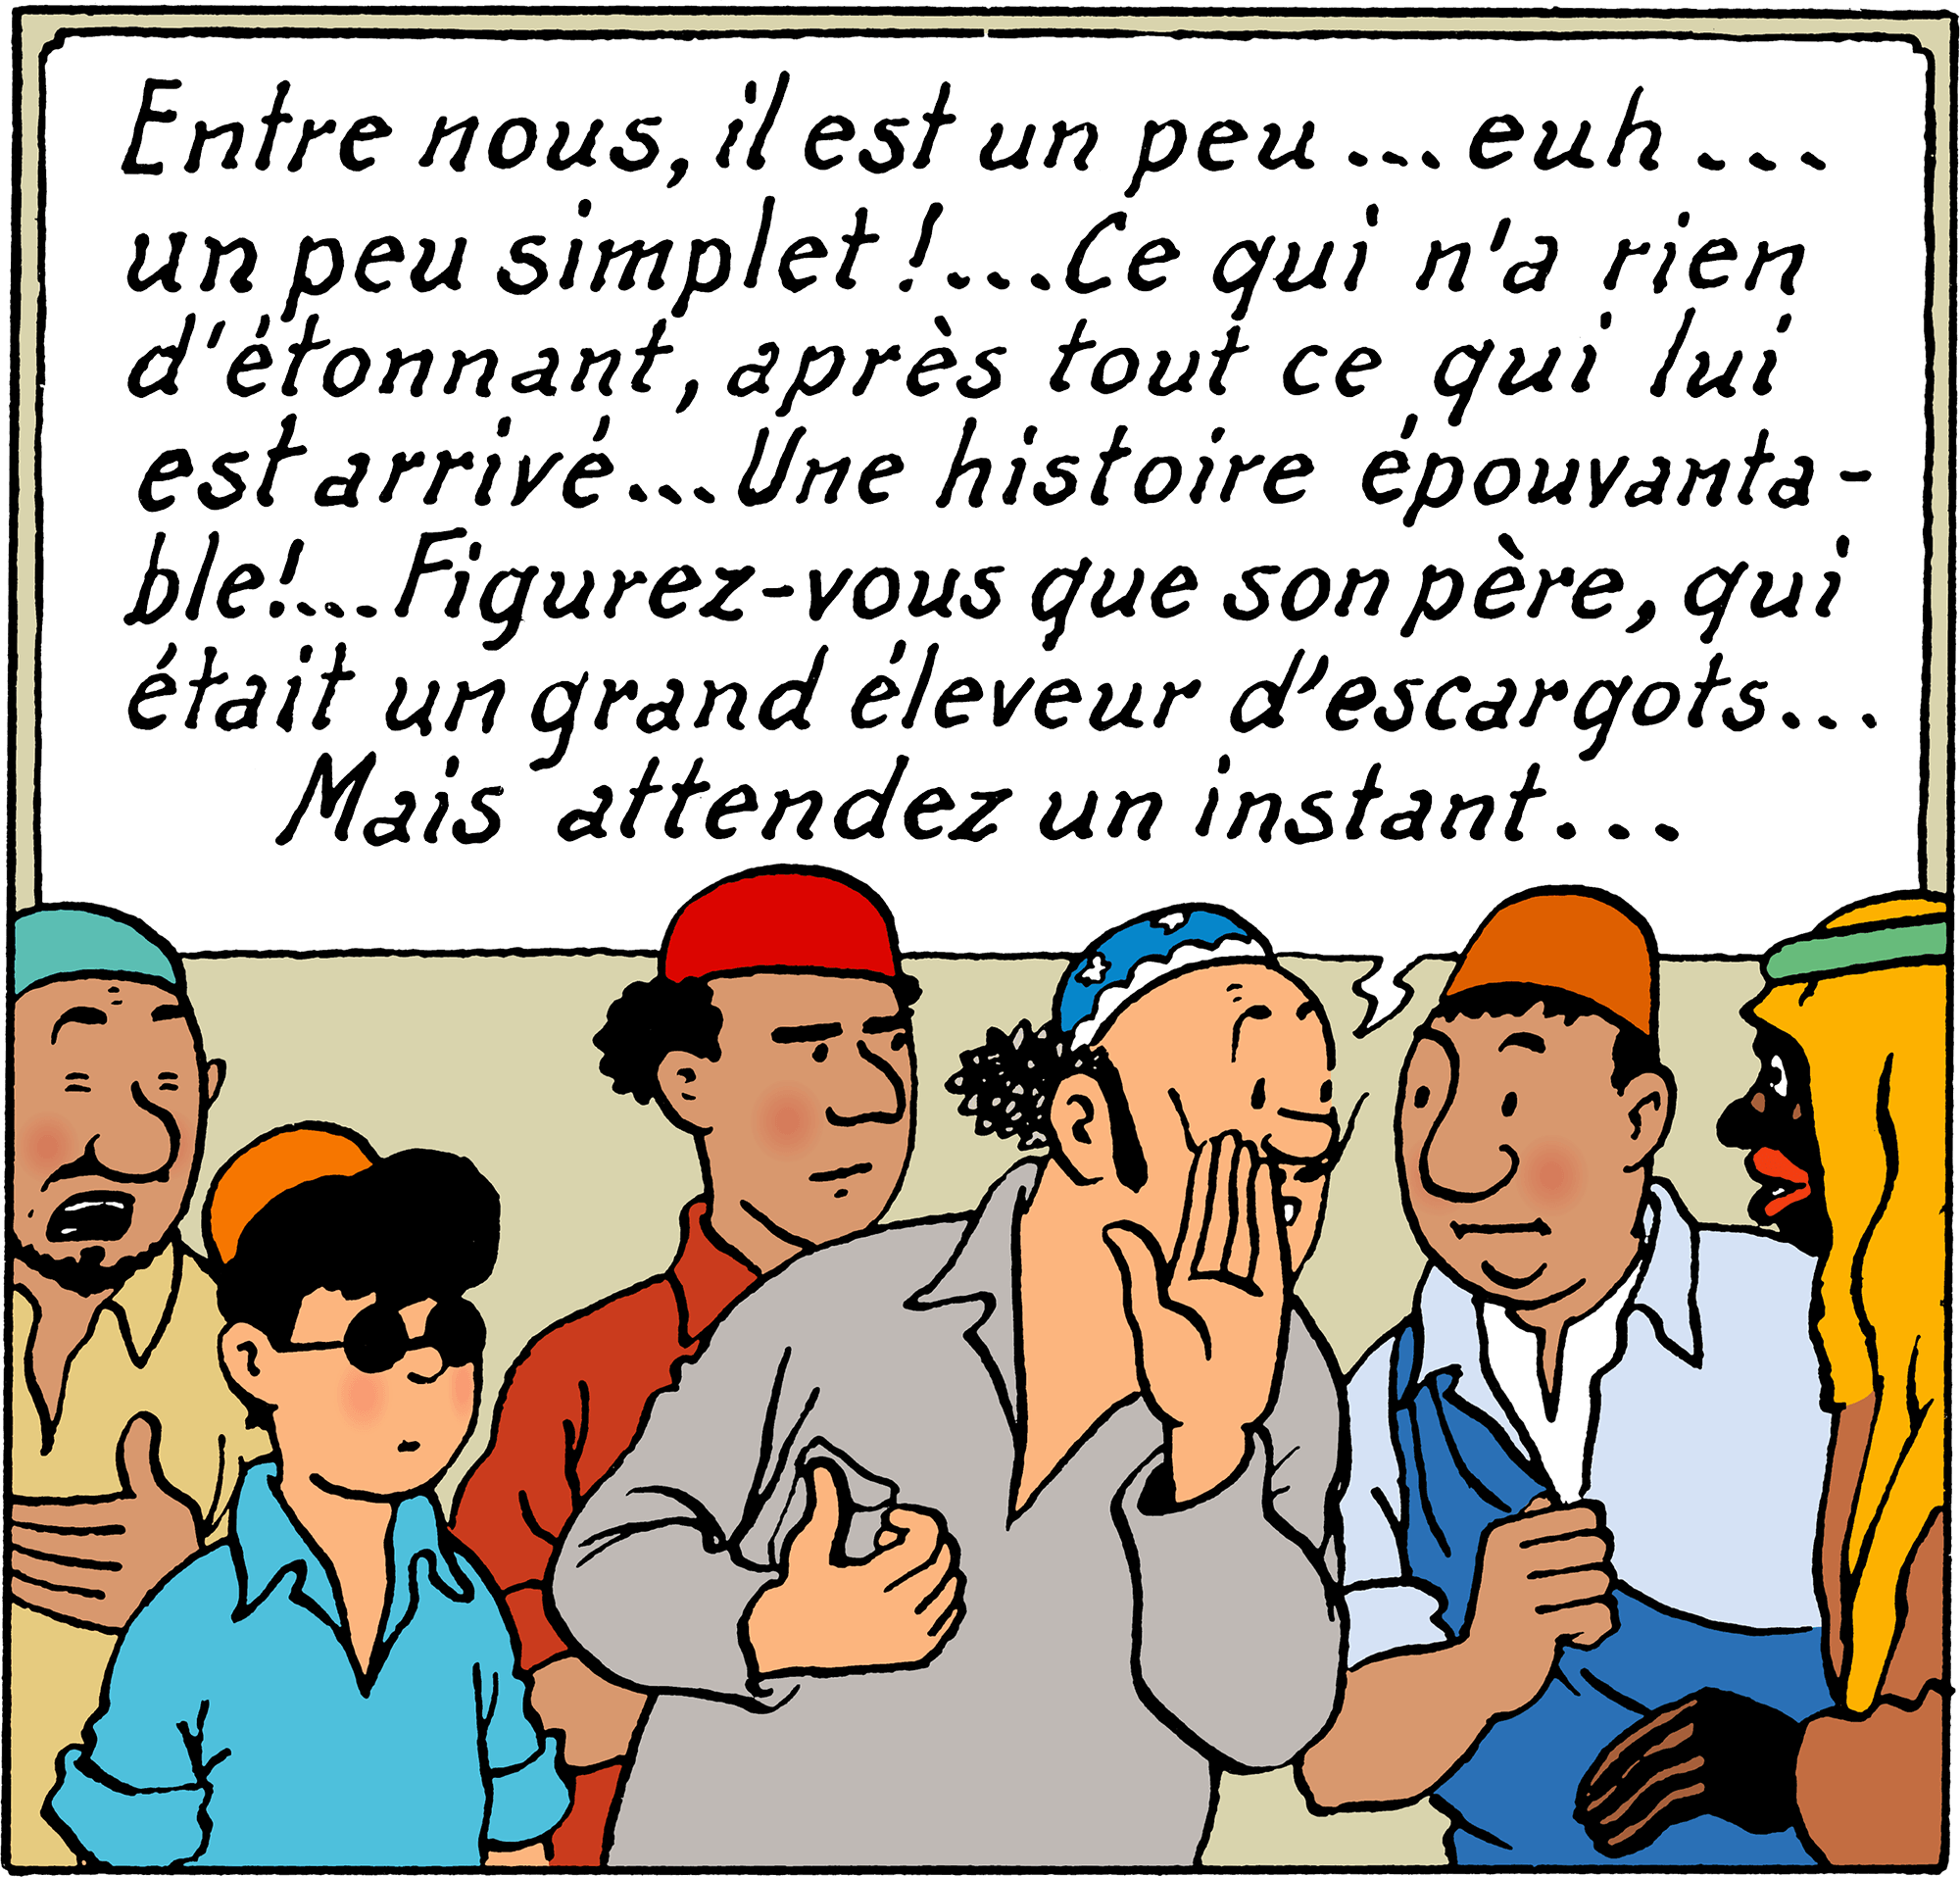 Tintin - Les Aventures de Tintin - Tintin au pays de l'or noir - Personnage Oliveira da Figueira